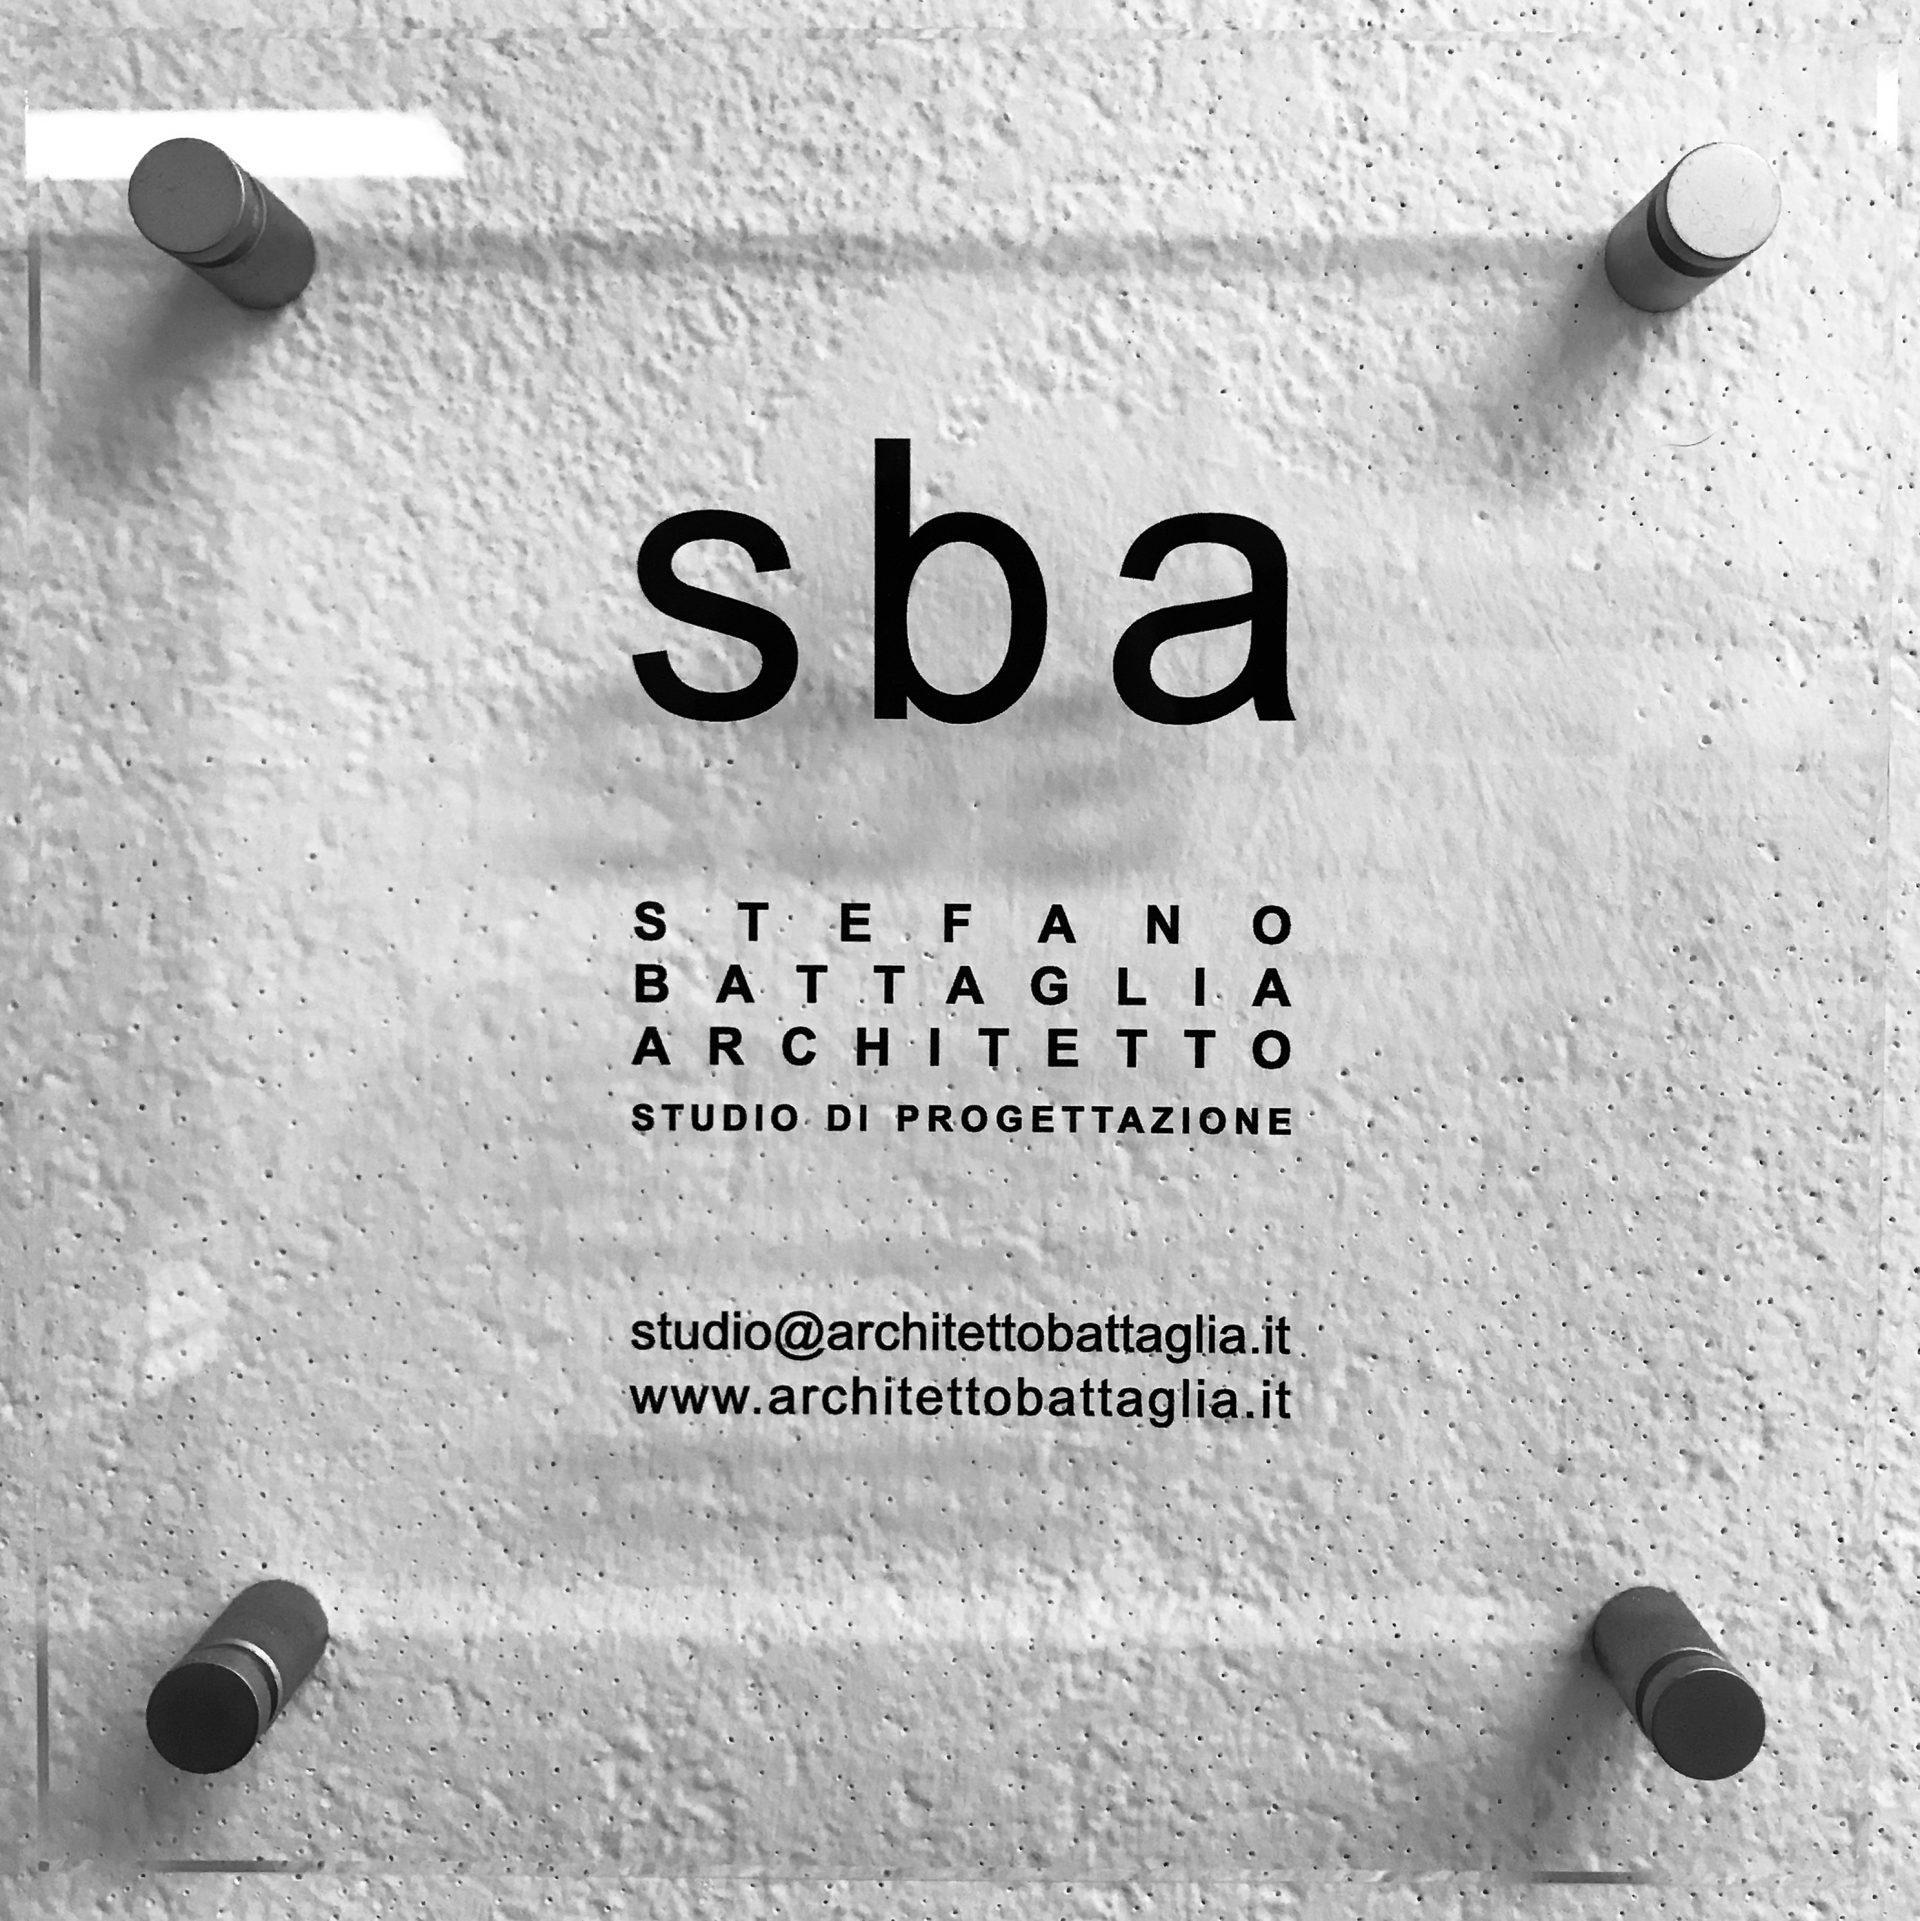 Fotografia della targa dello studio SBA